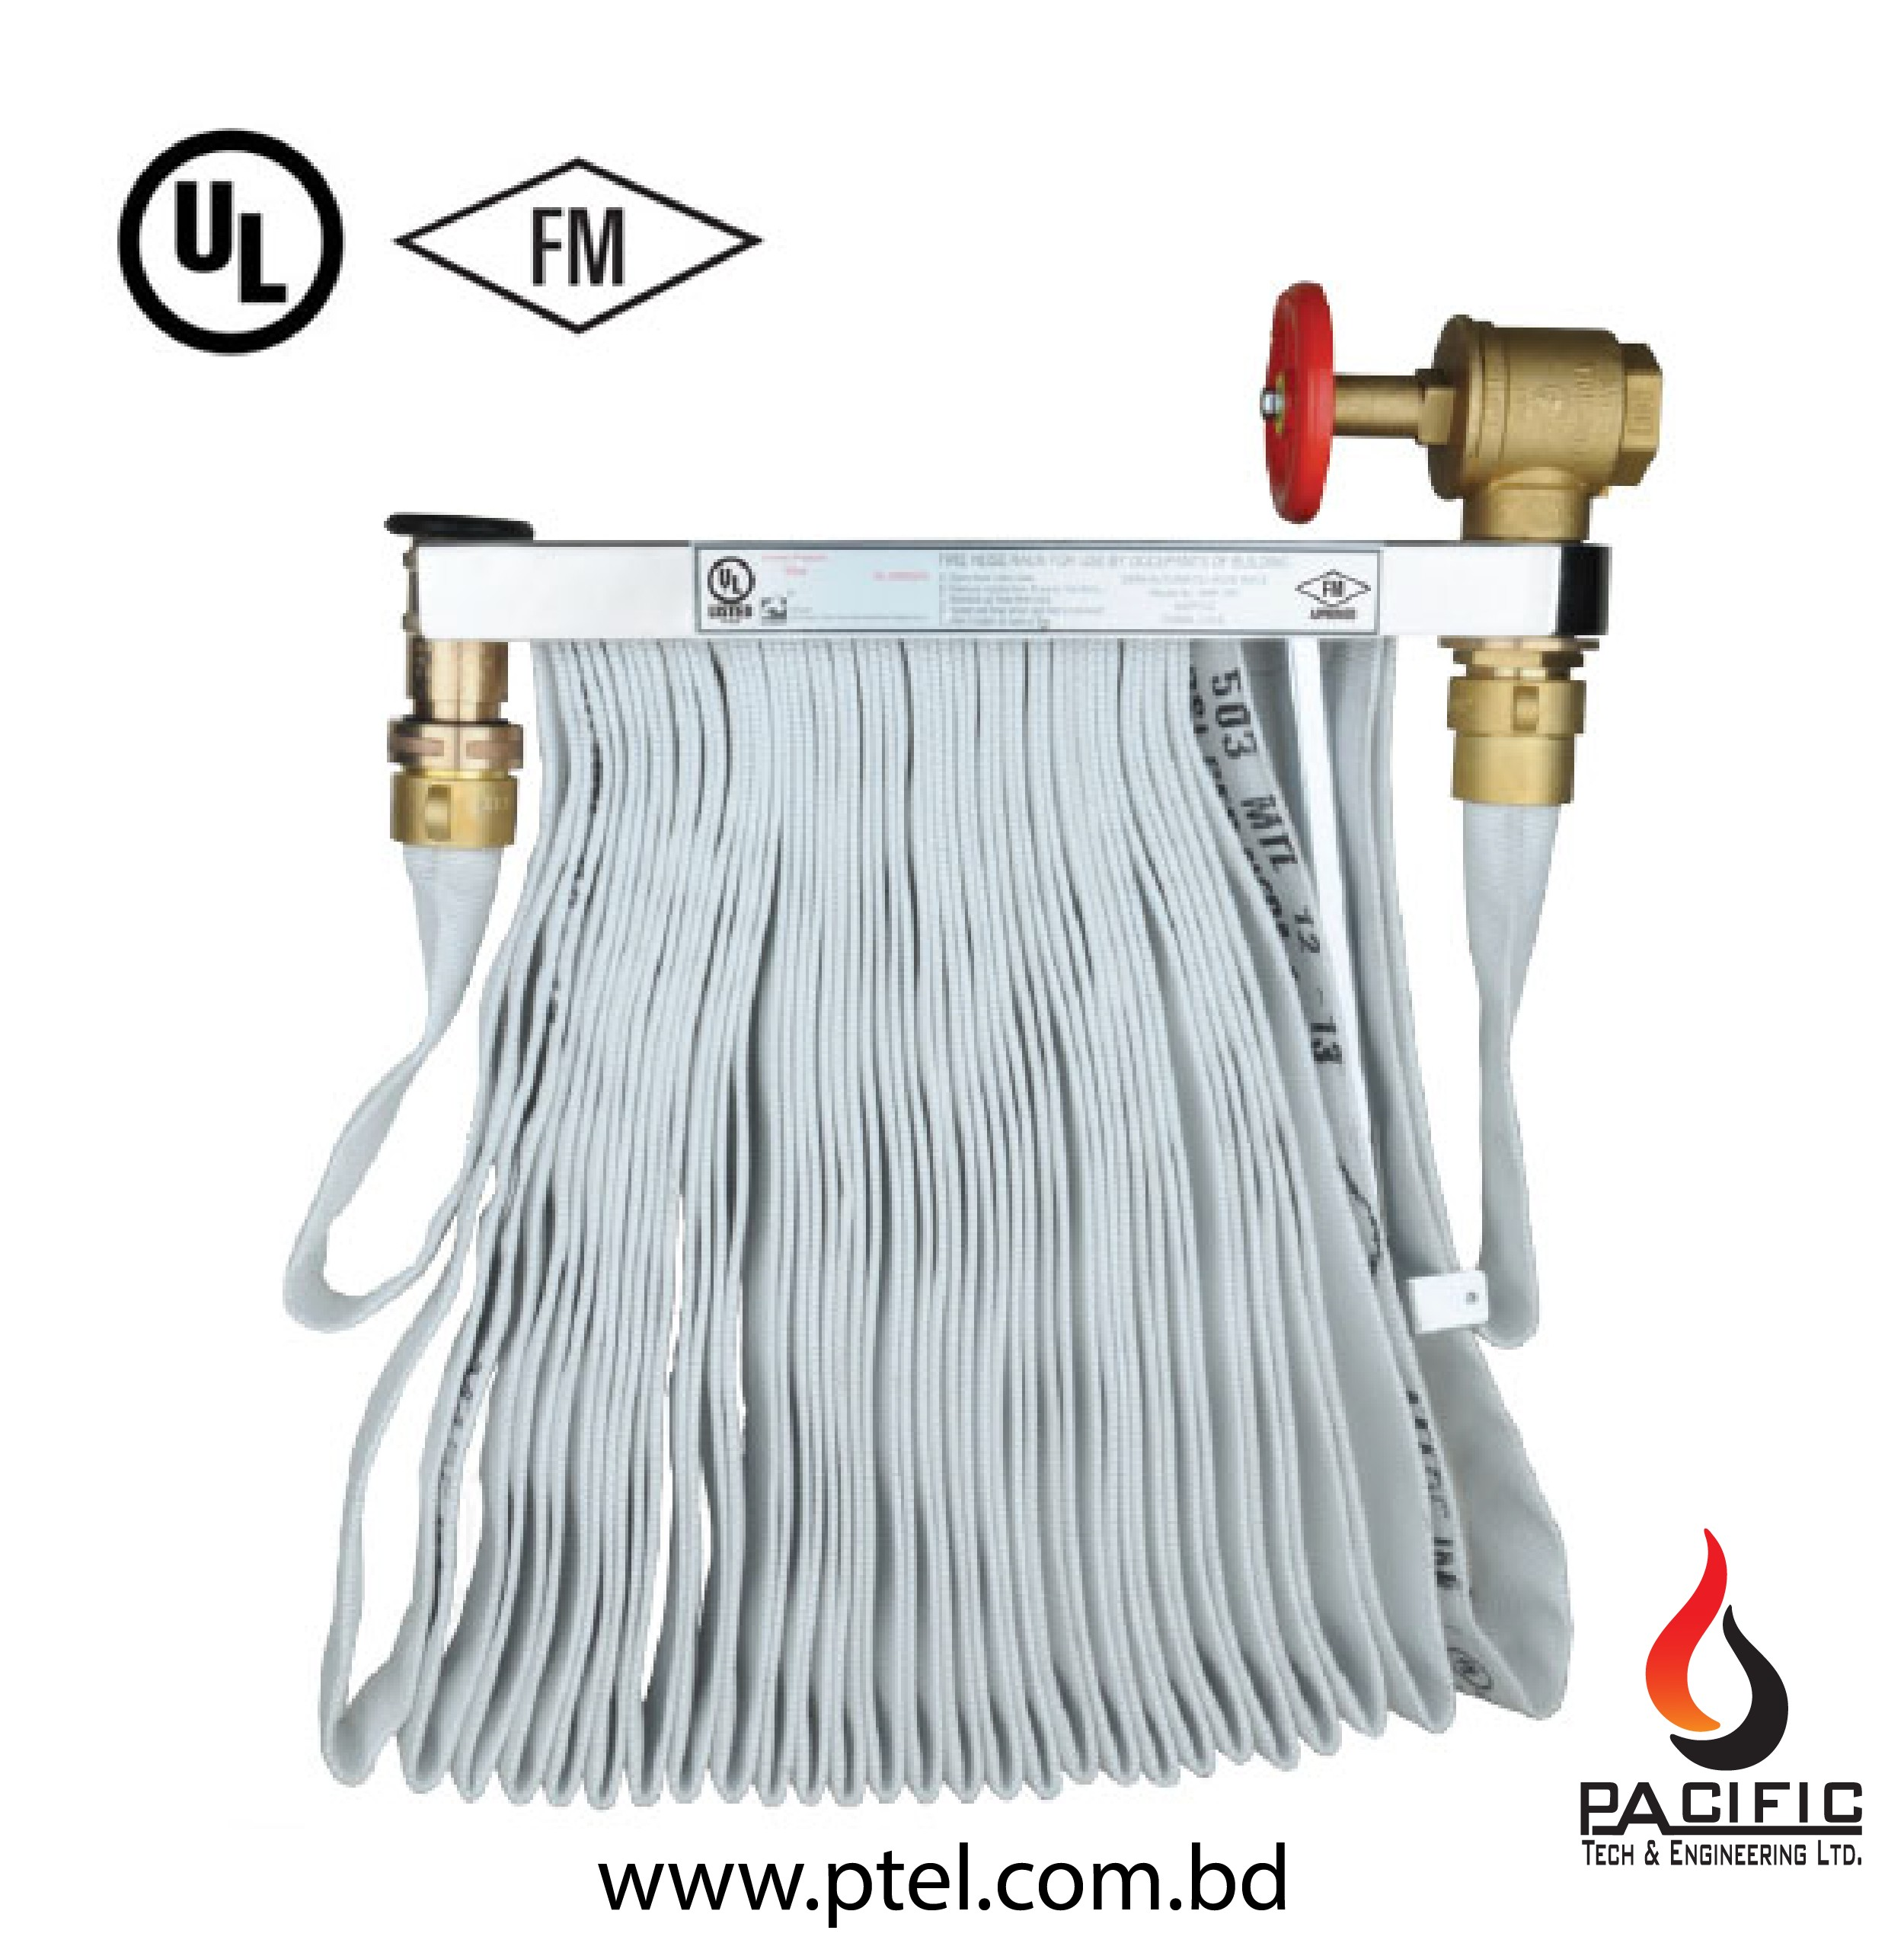 Fire Hydrant Hose Rack